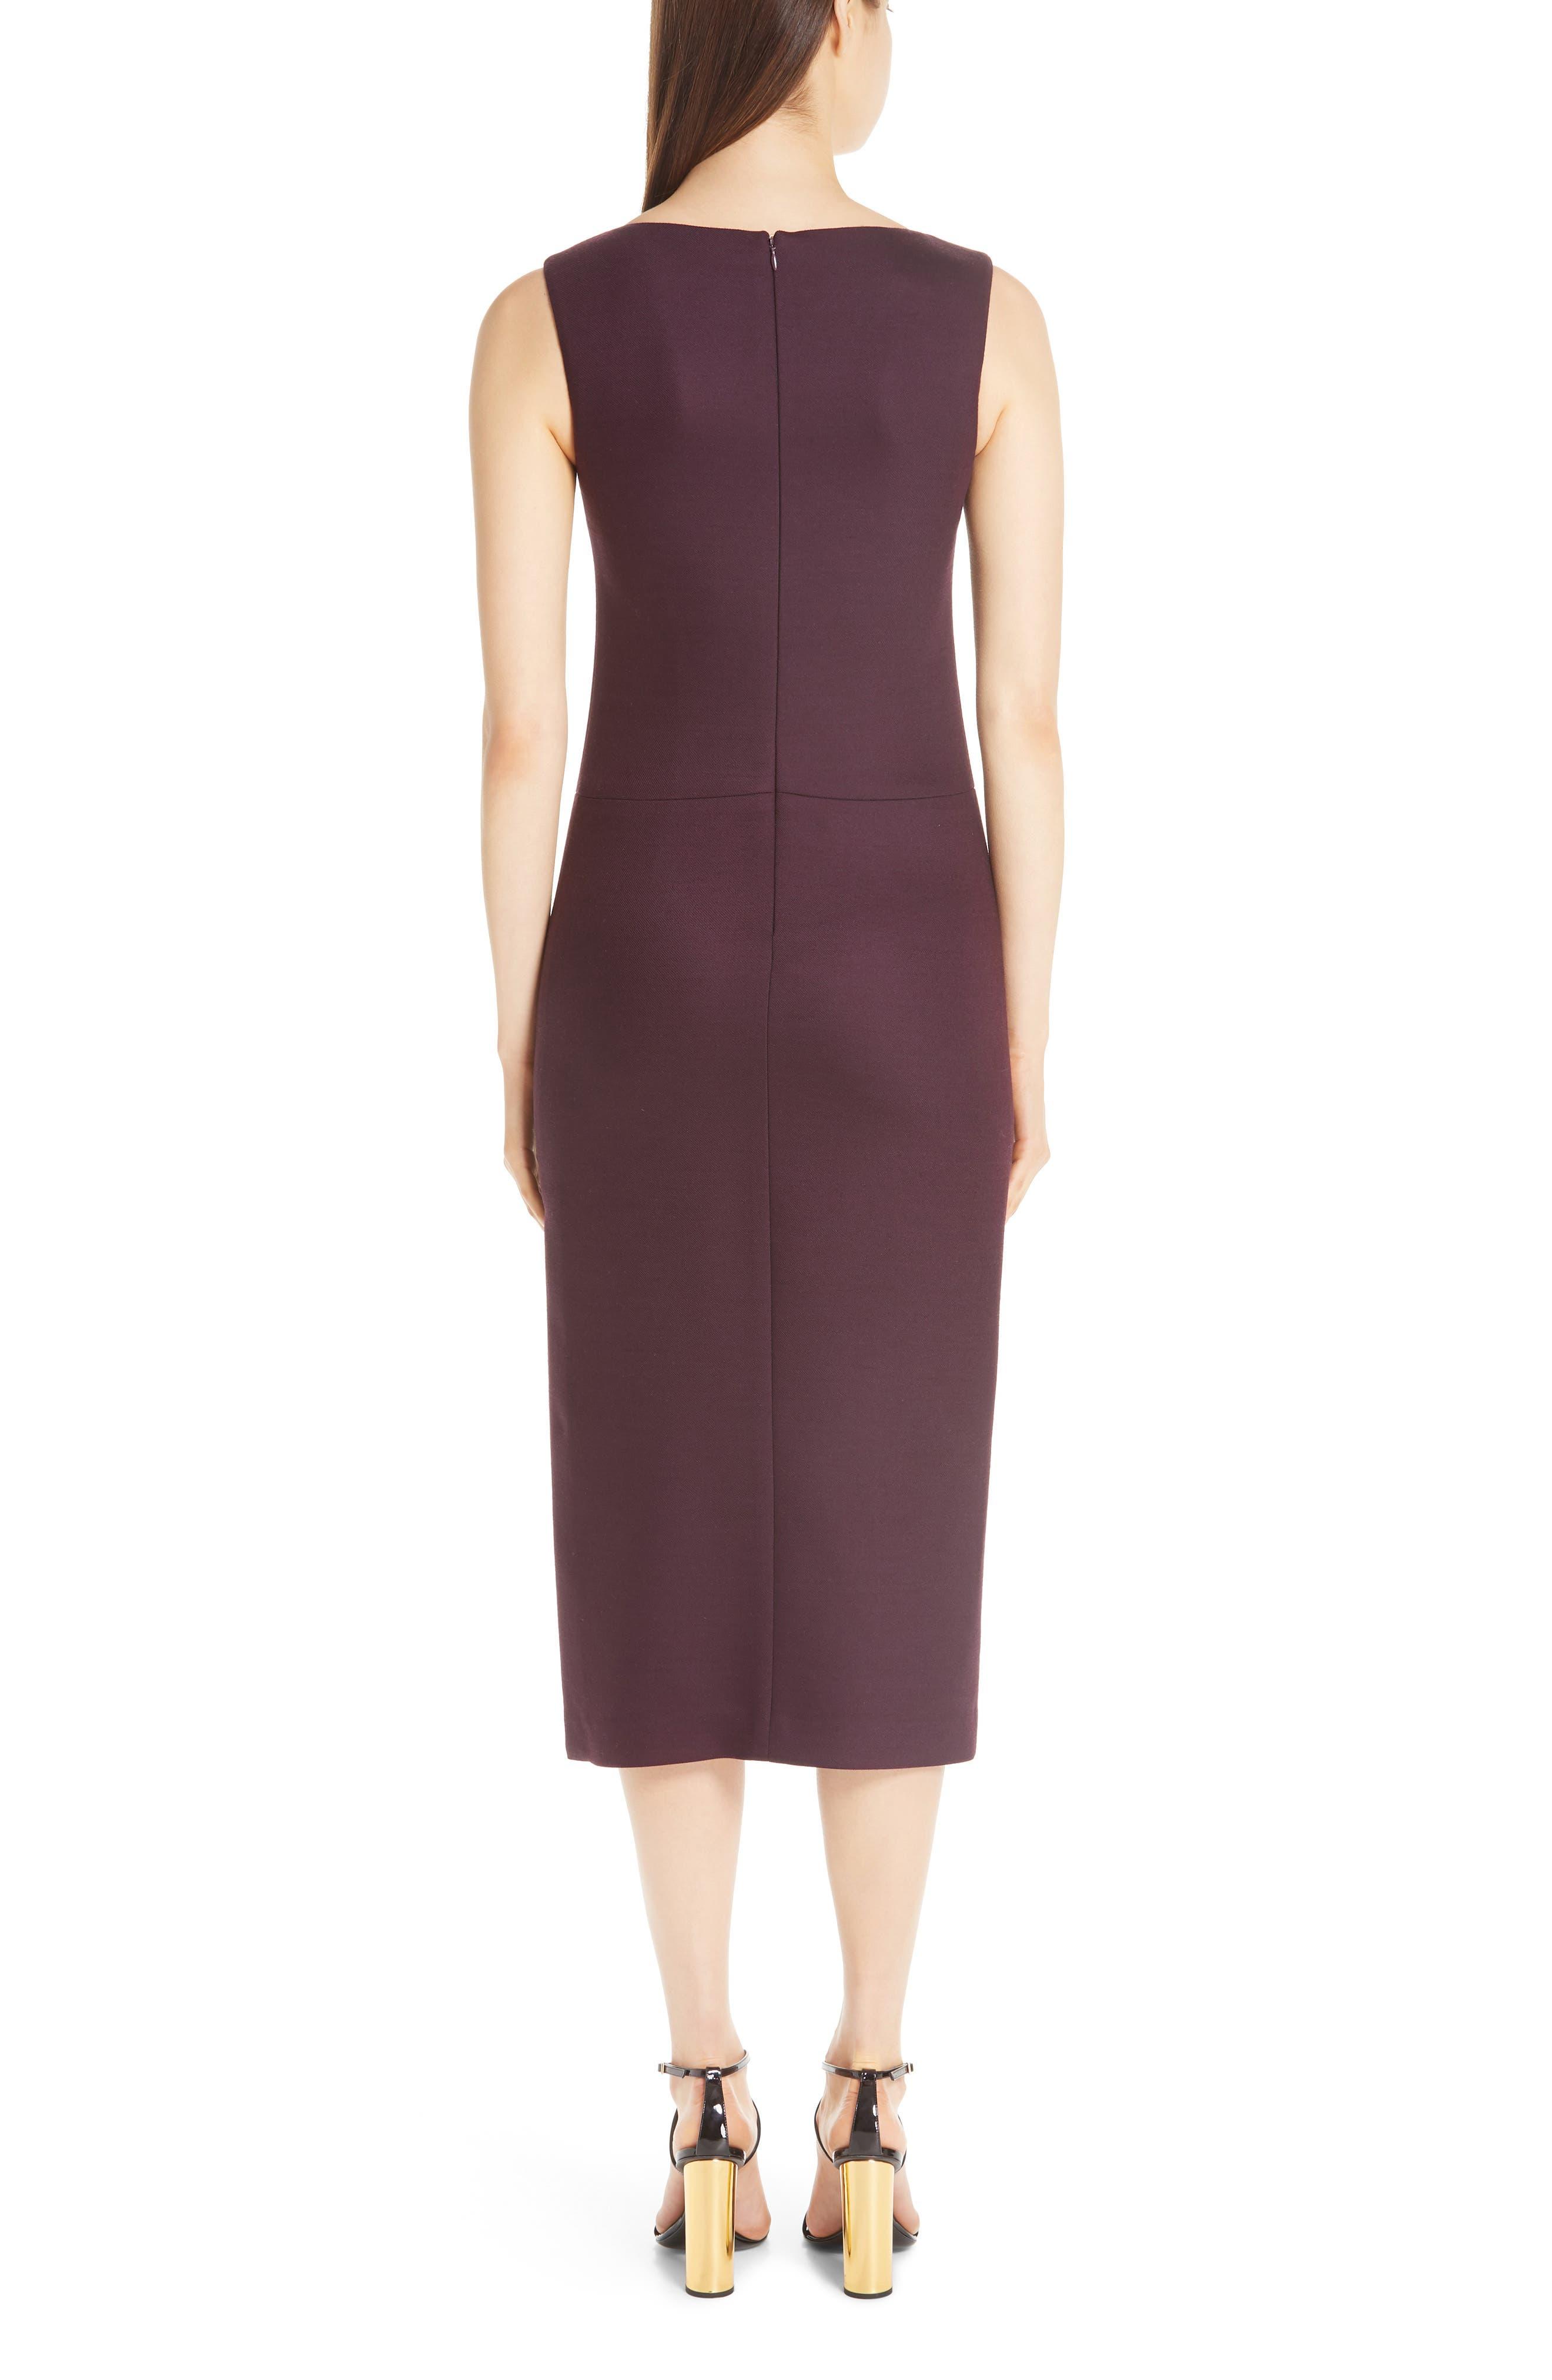 ADAM LIPPES,                             Double Face Wool Sheath Dress,                             Alternate thumbnail 2, color,                             BURGUNDY/ PINK